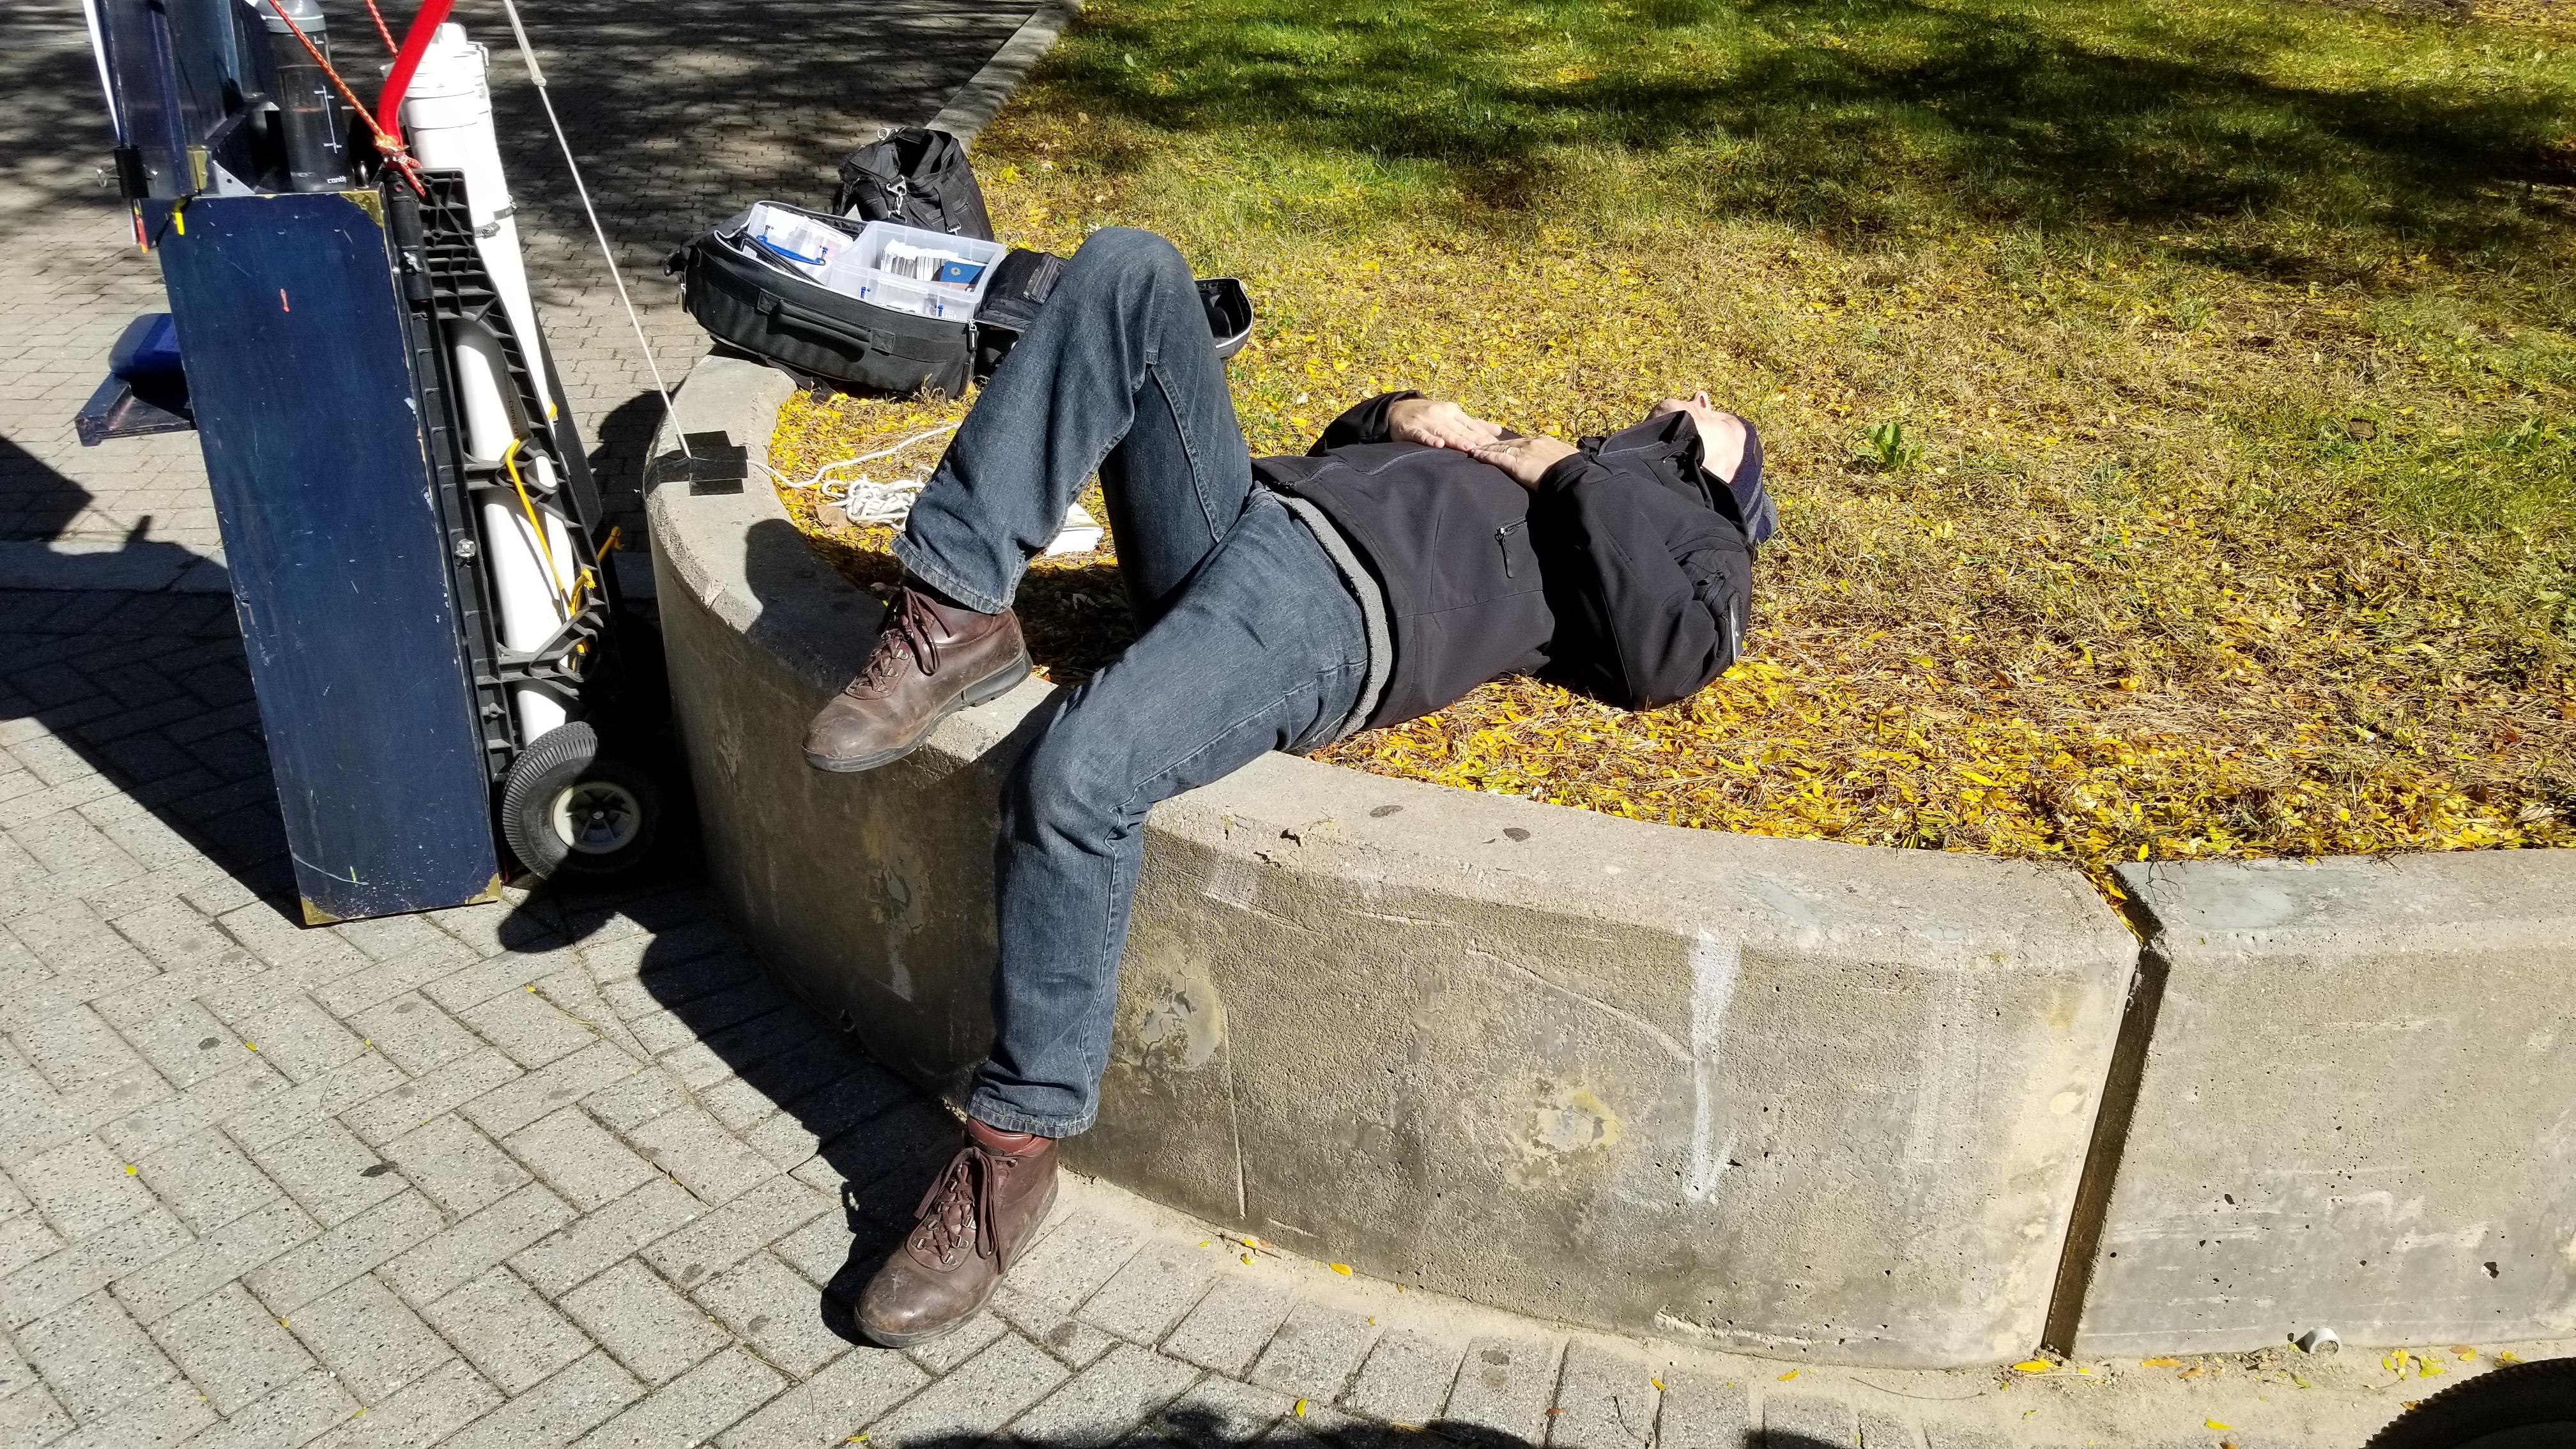 Think evangelism isn't tiring work? I caught Chris laying down on the job! LOL